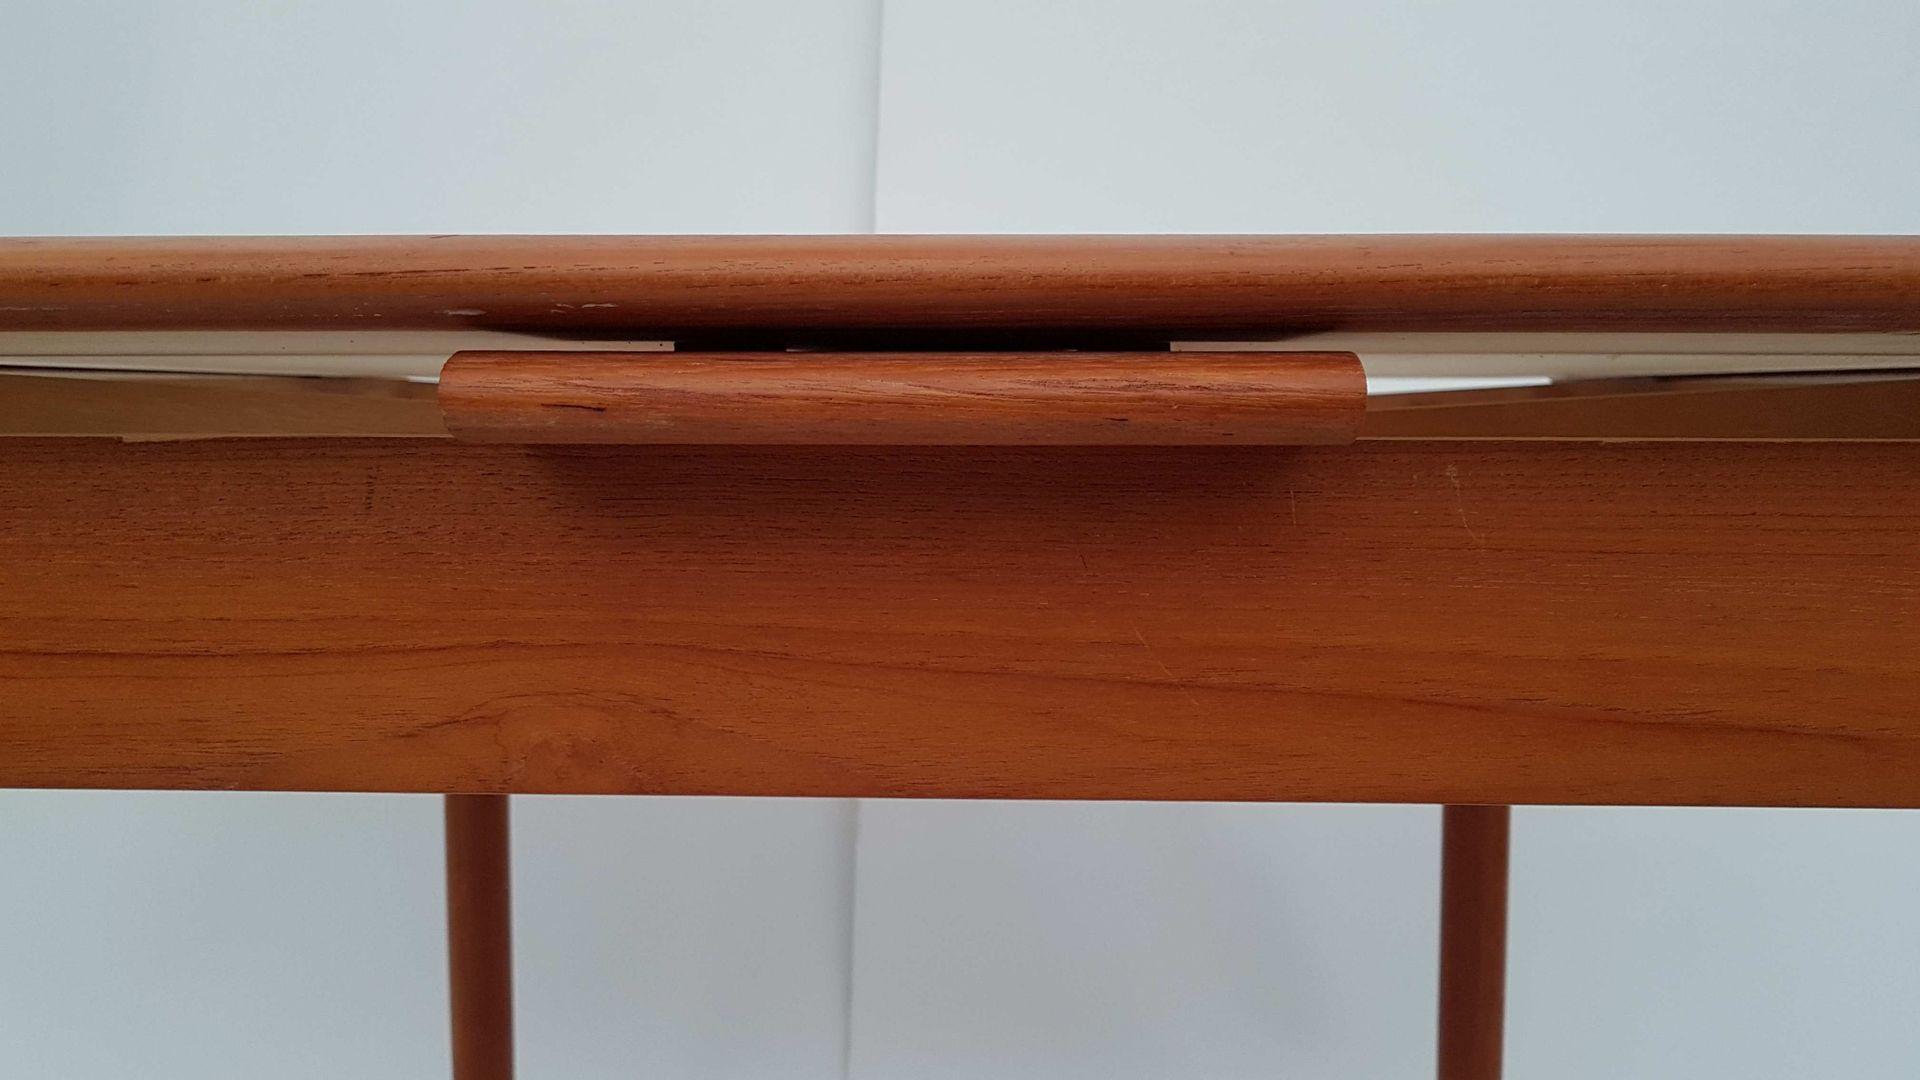 Danish Flip Top Teak Dining Table by Poul Hundevad for  : danish flip top teak dining table by poul hundevad for dogvad mobelfabrik 1960s 3 from www.pamono.com size 1920 x 1080 jpeg 117kB